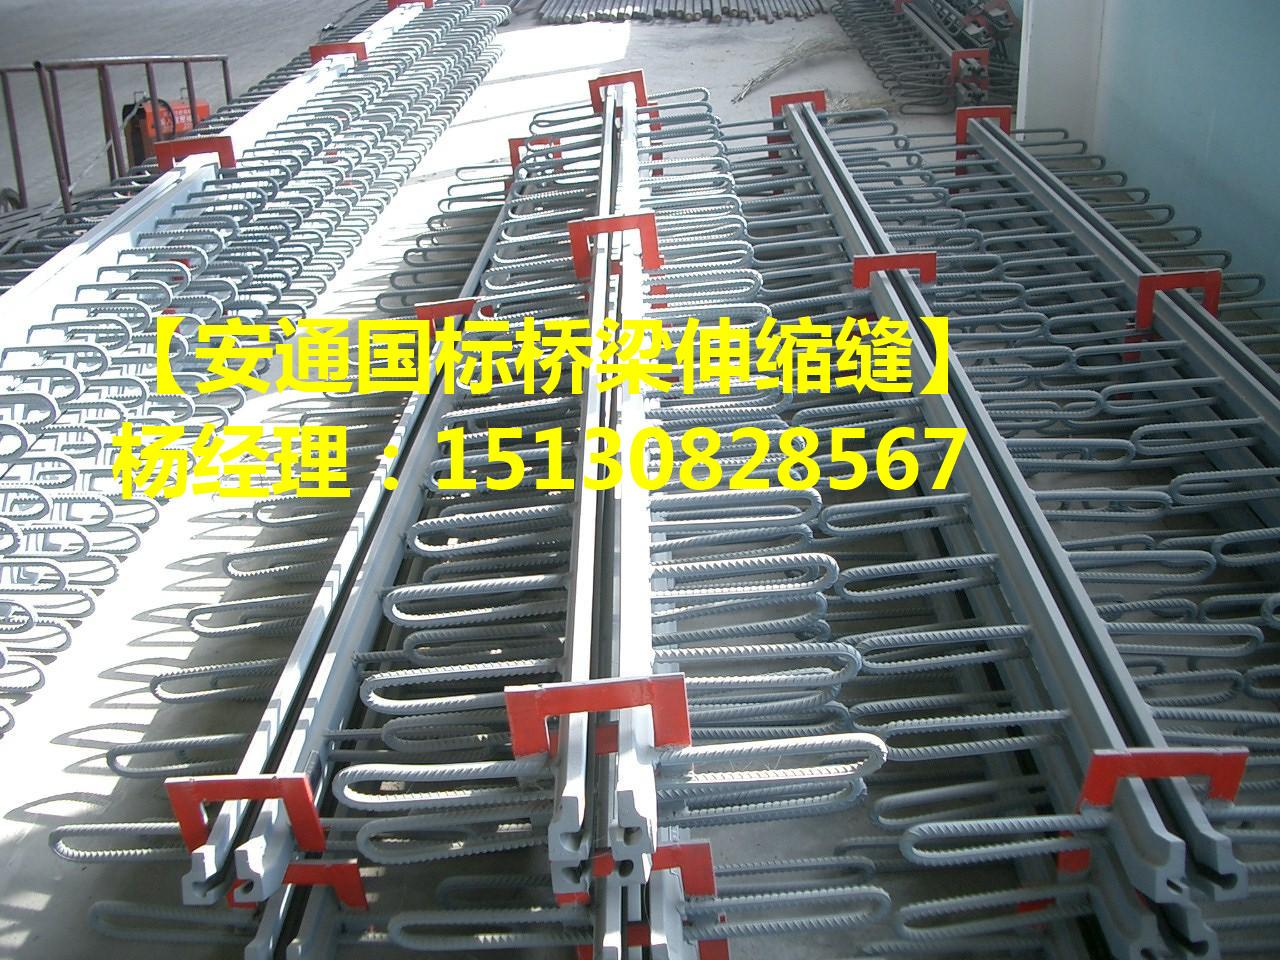 GQF-C型单组式桥梁伸缩缝 安通良品伸缩缝厂家简介4